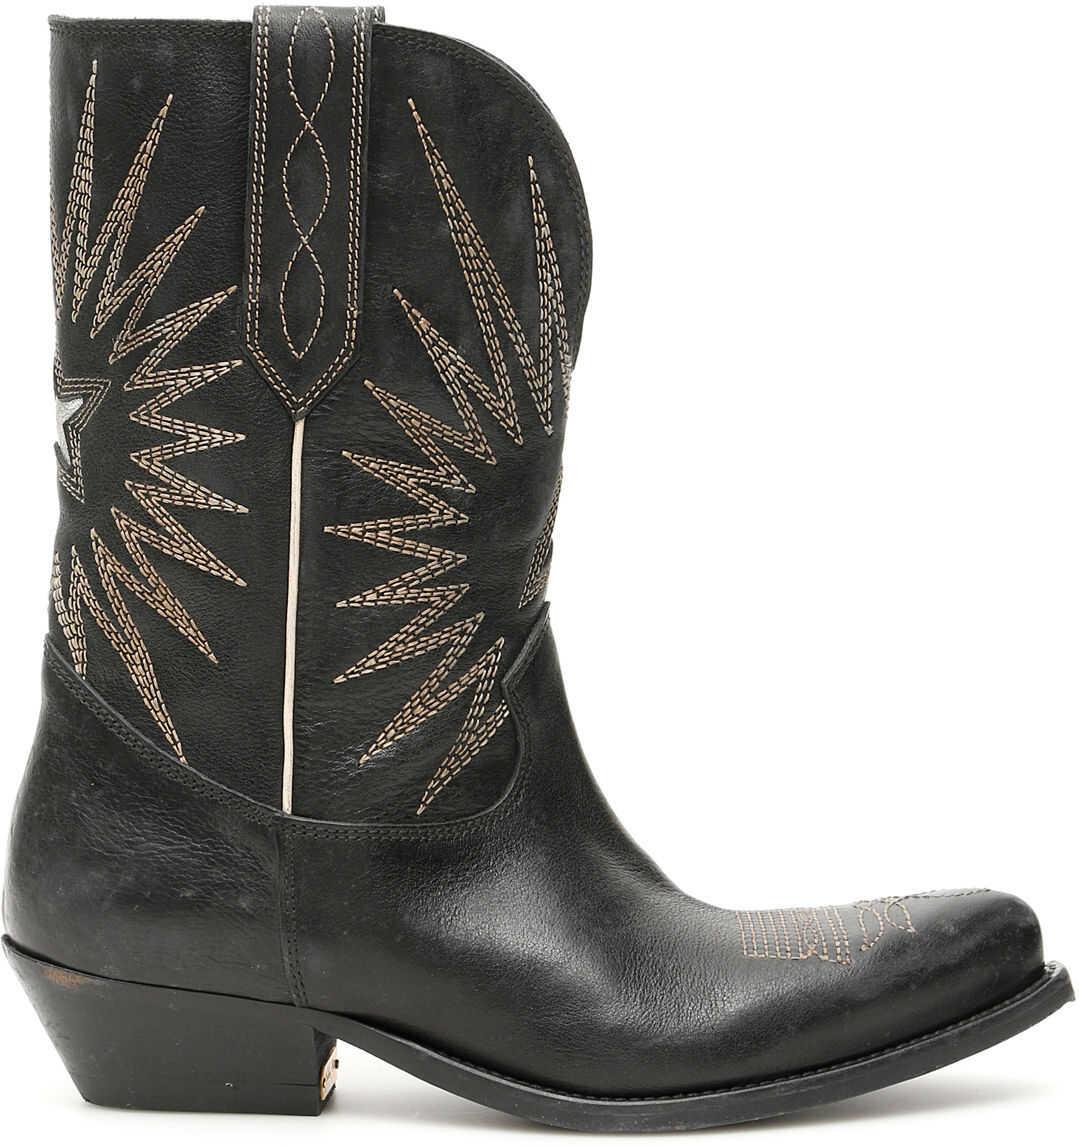 Golden Goose Wish Star Boots BLACK